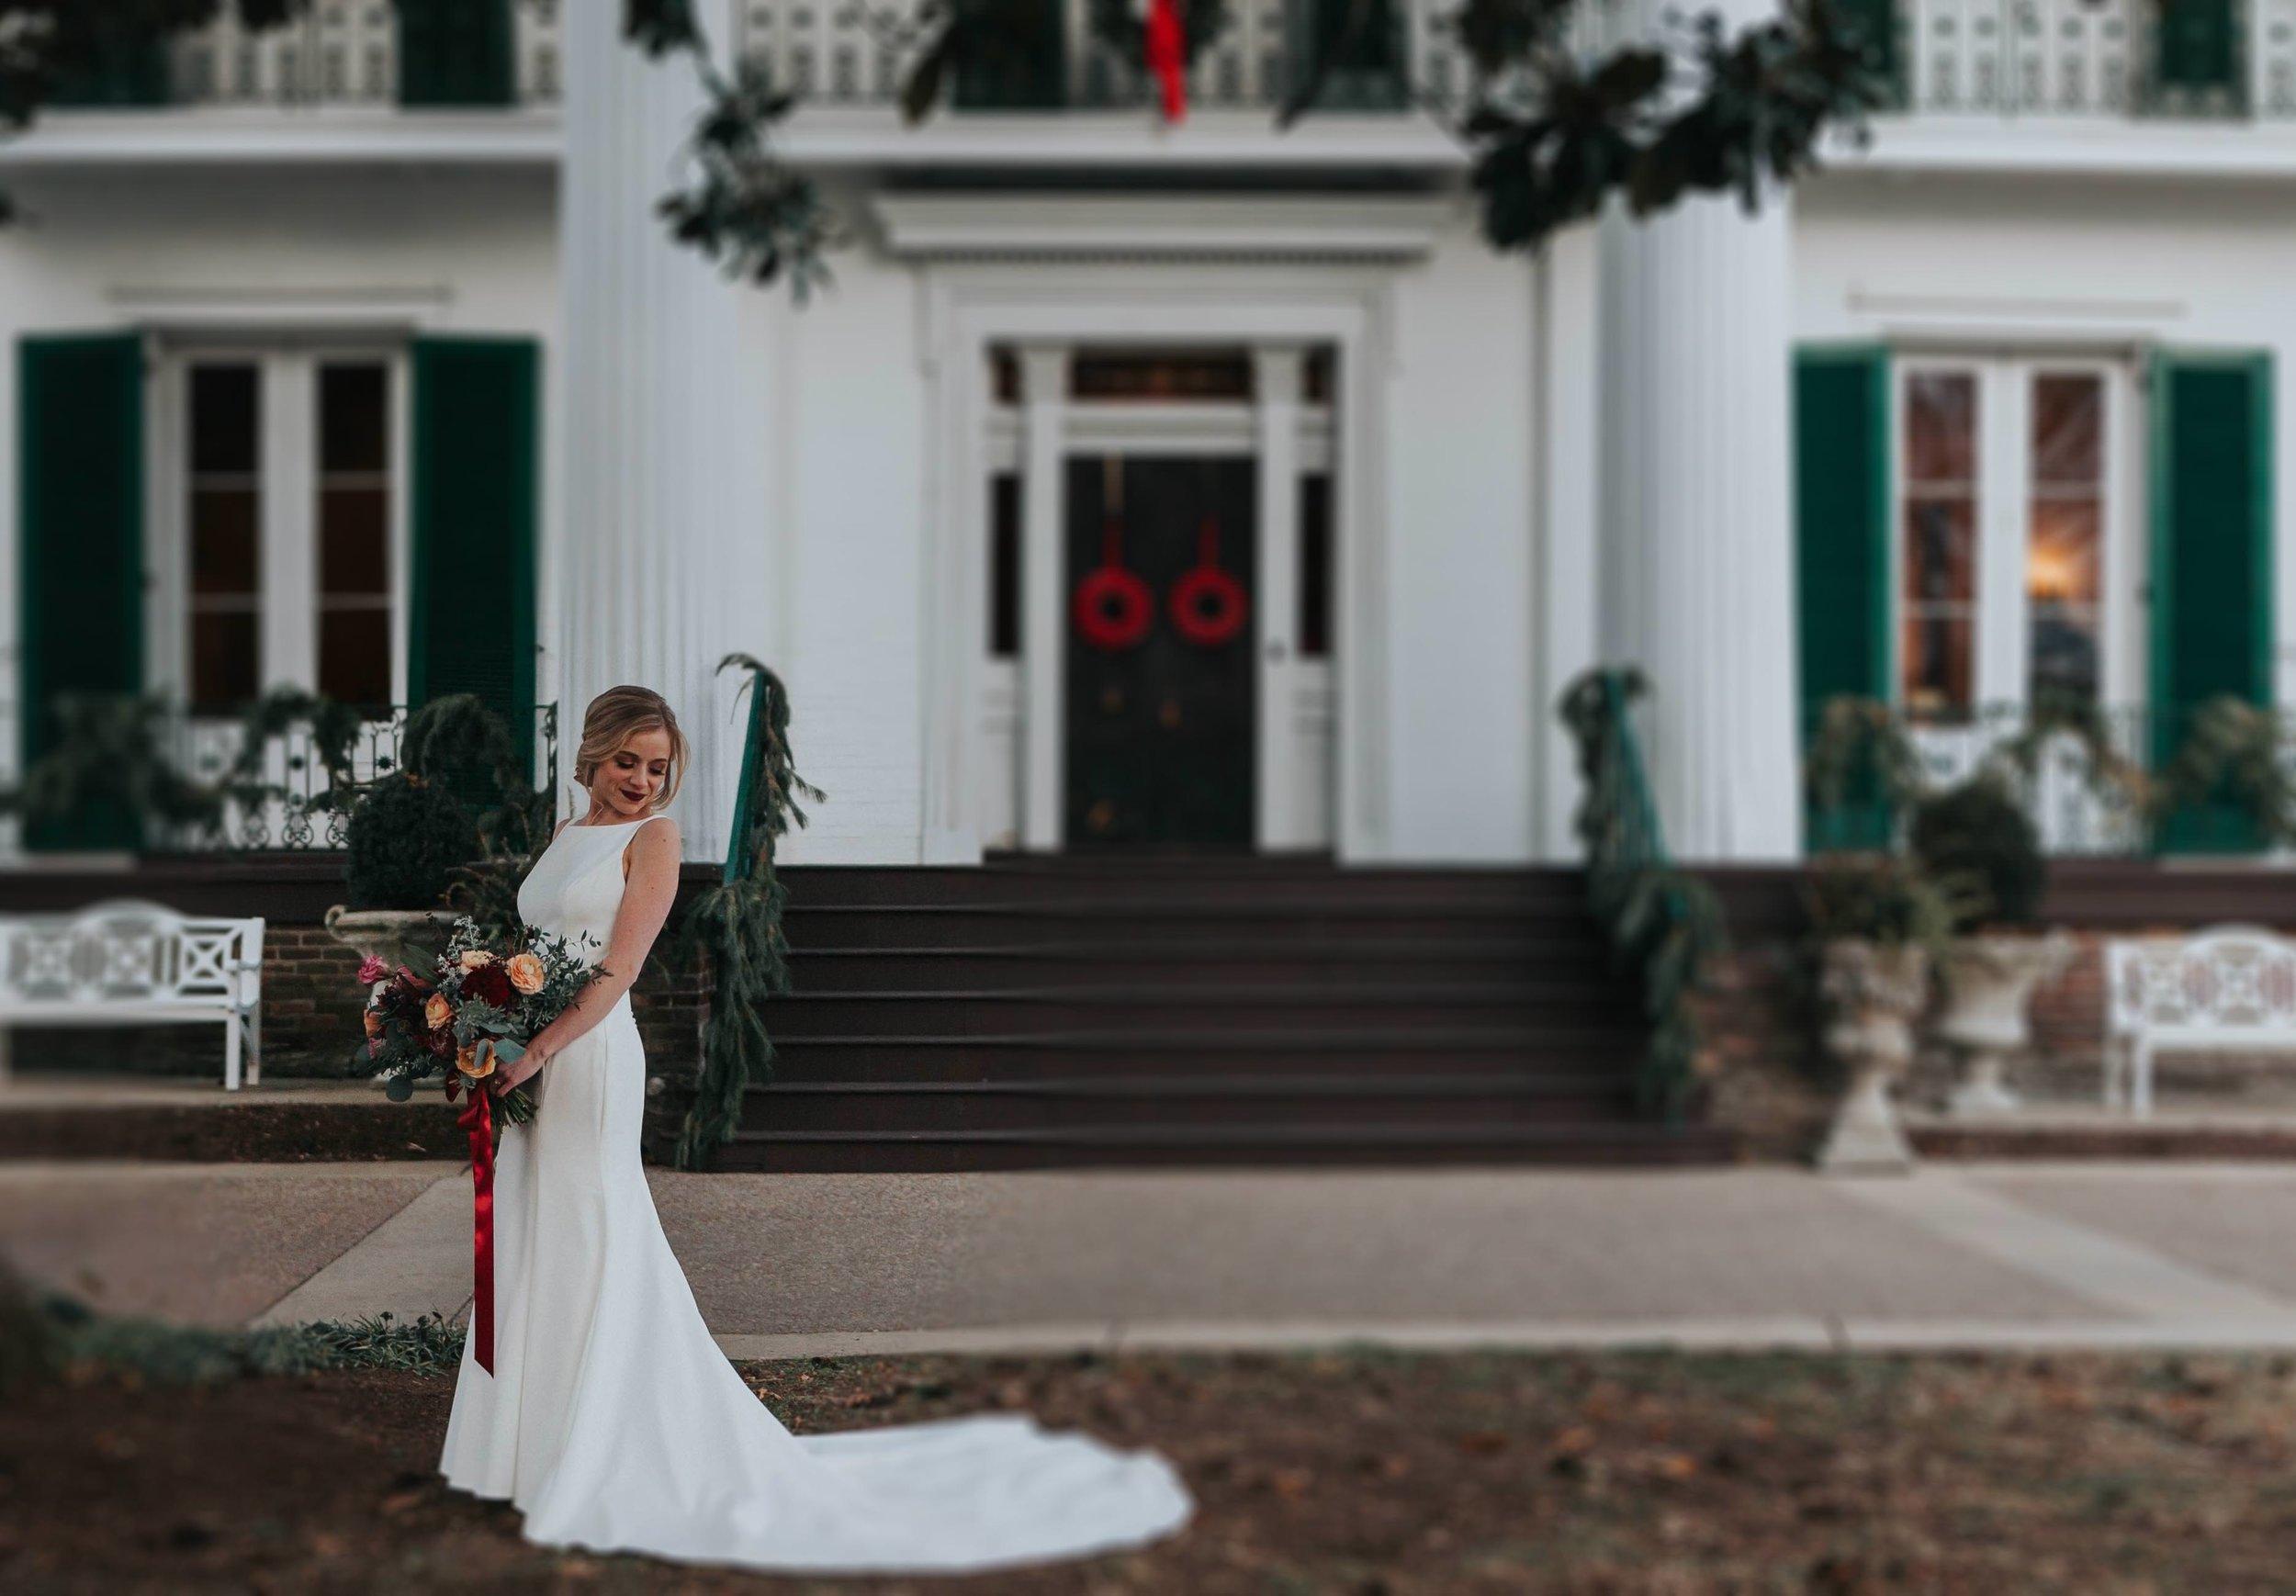 Charis_Lauren_Romantic_Wedding_Photographer_Nashville_01089.jpg